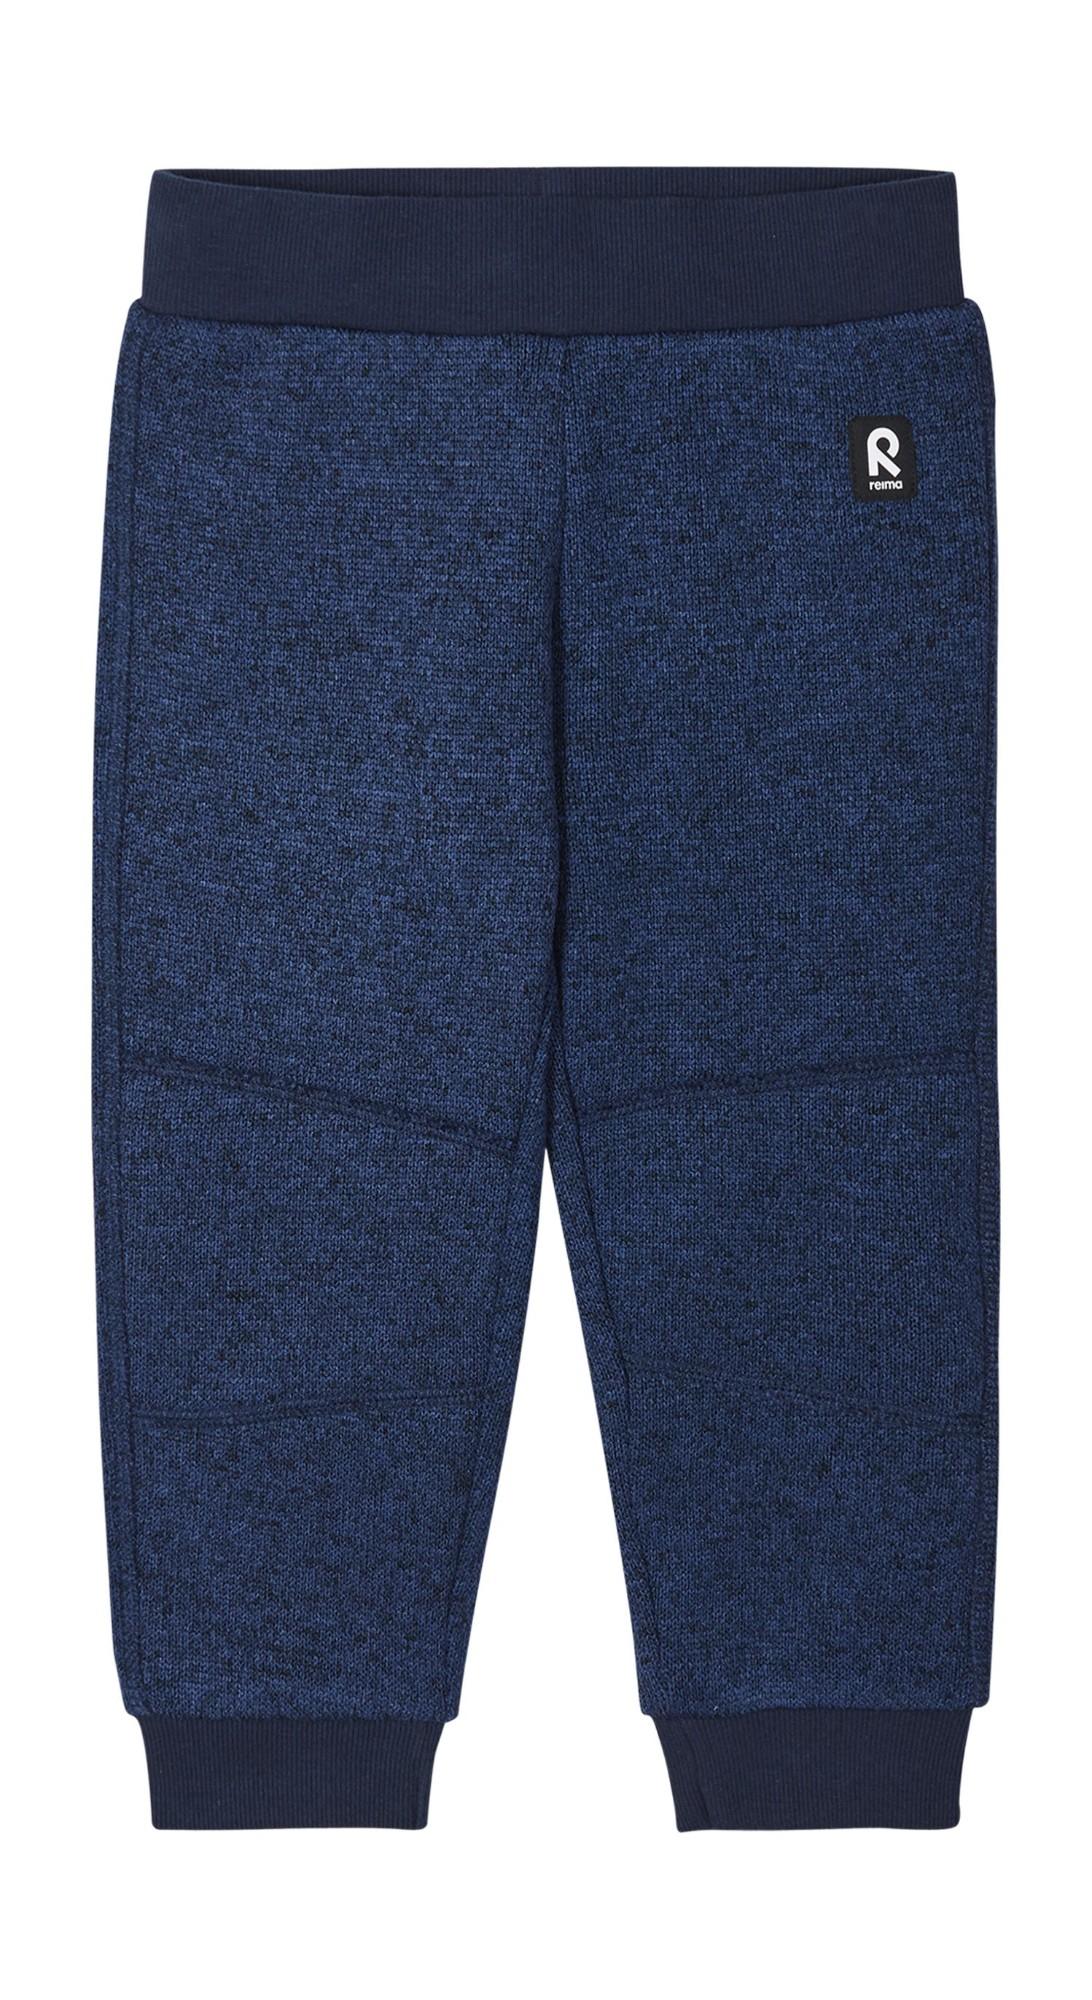 REIMA Vuotos 516593 Jeans Blue 86